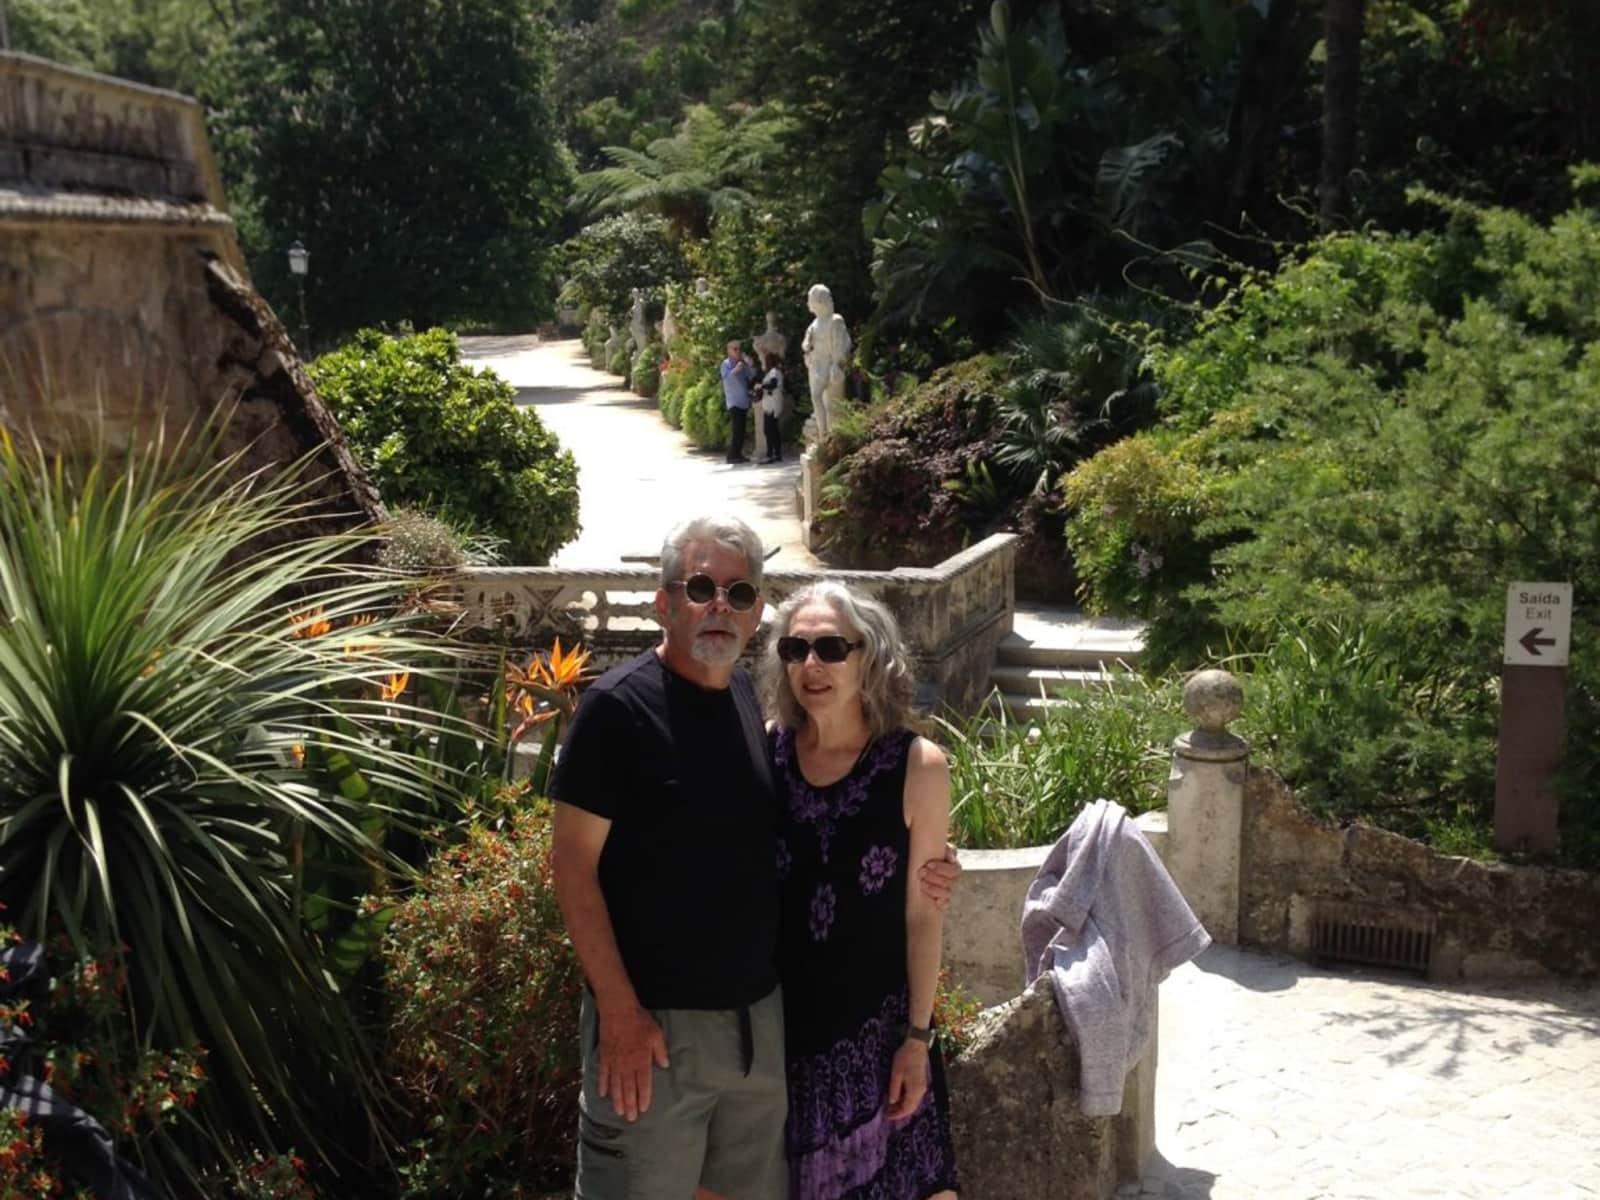 Edna & Todd from Hillsborough, North Carolina, United States